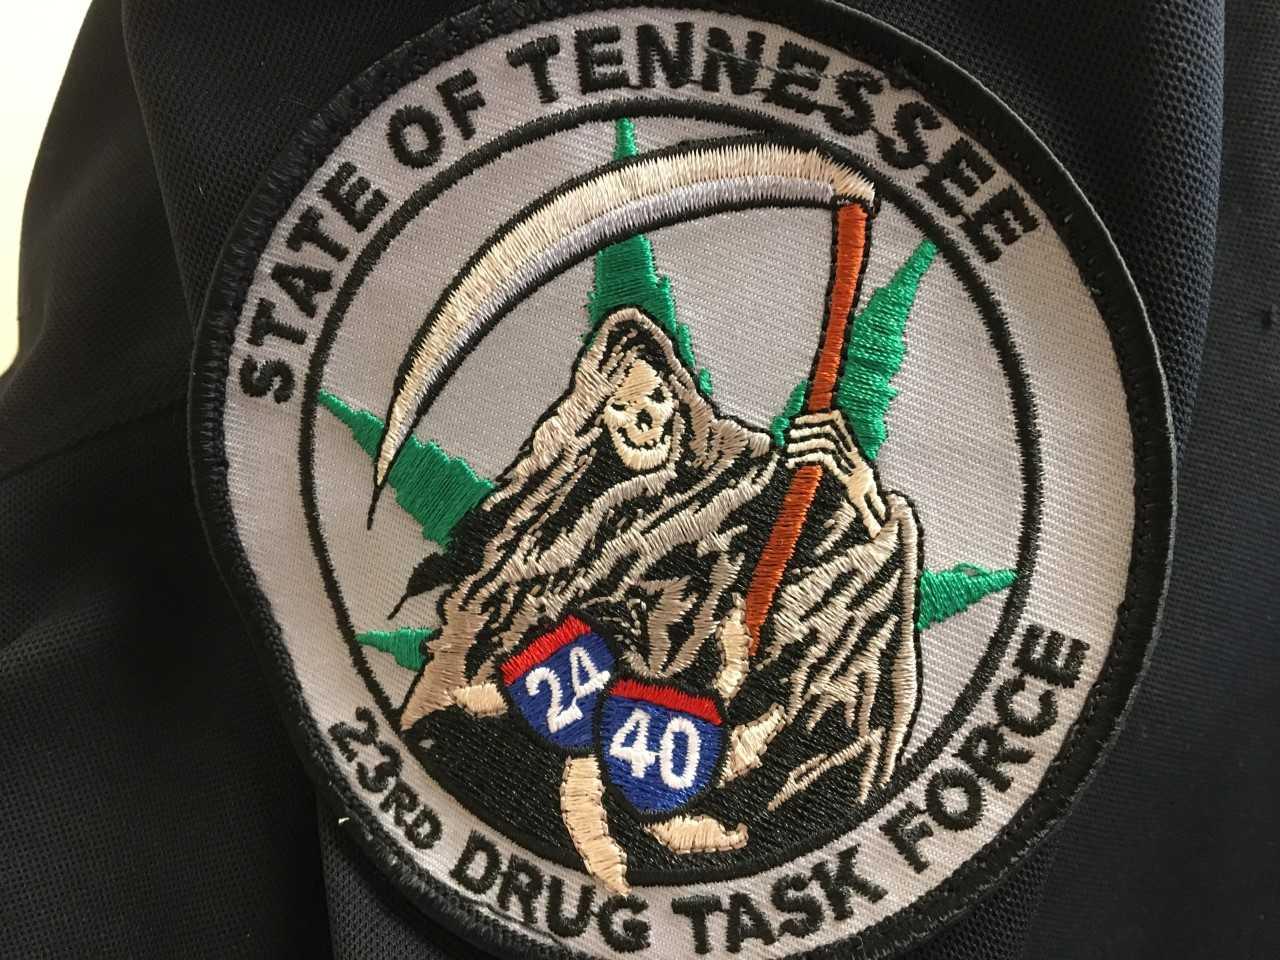 23rd Drug Task Force generic_1530825189427.jpg.jpg